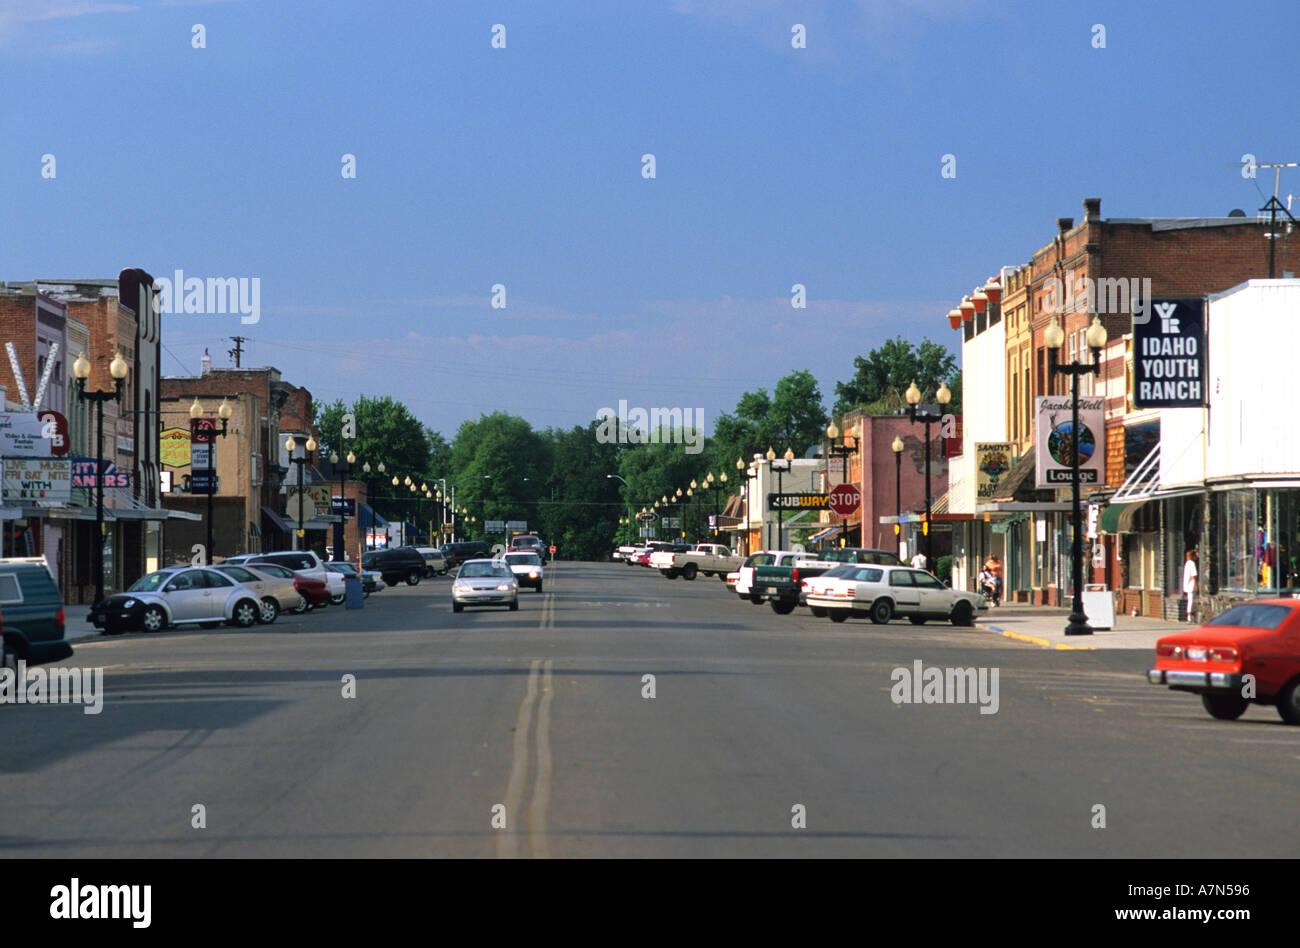 Downtown Payette Idaho downtown small town payette idaho america main street village Stock Photo